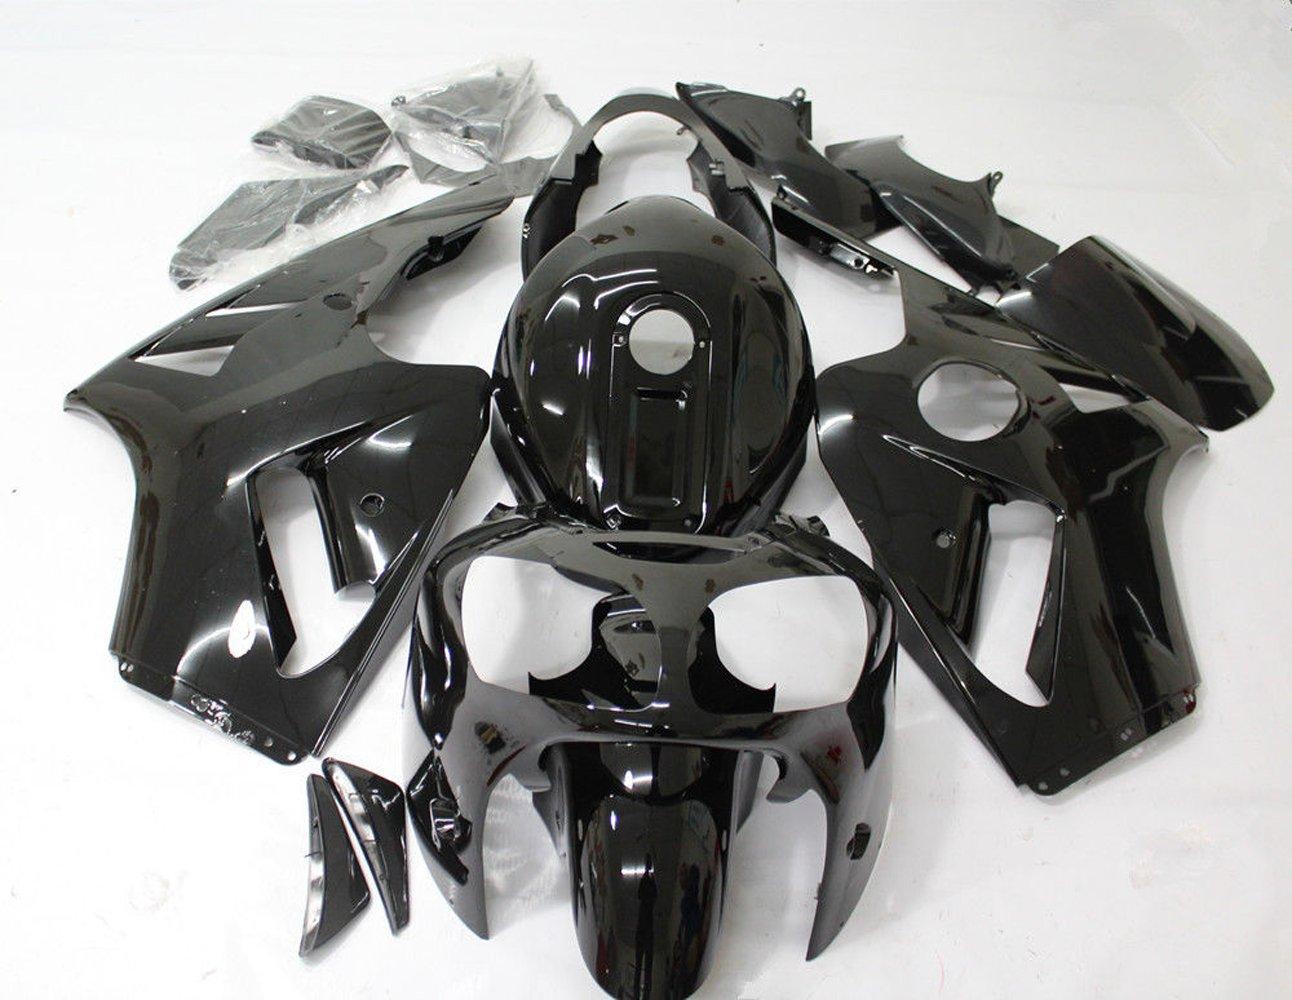 Amazon.com: ZXMOTO Motorbike Bodywork Fairing Kit For ...